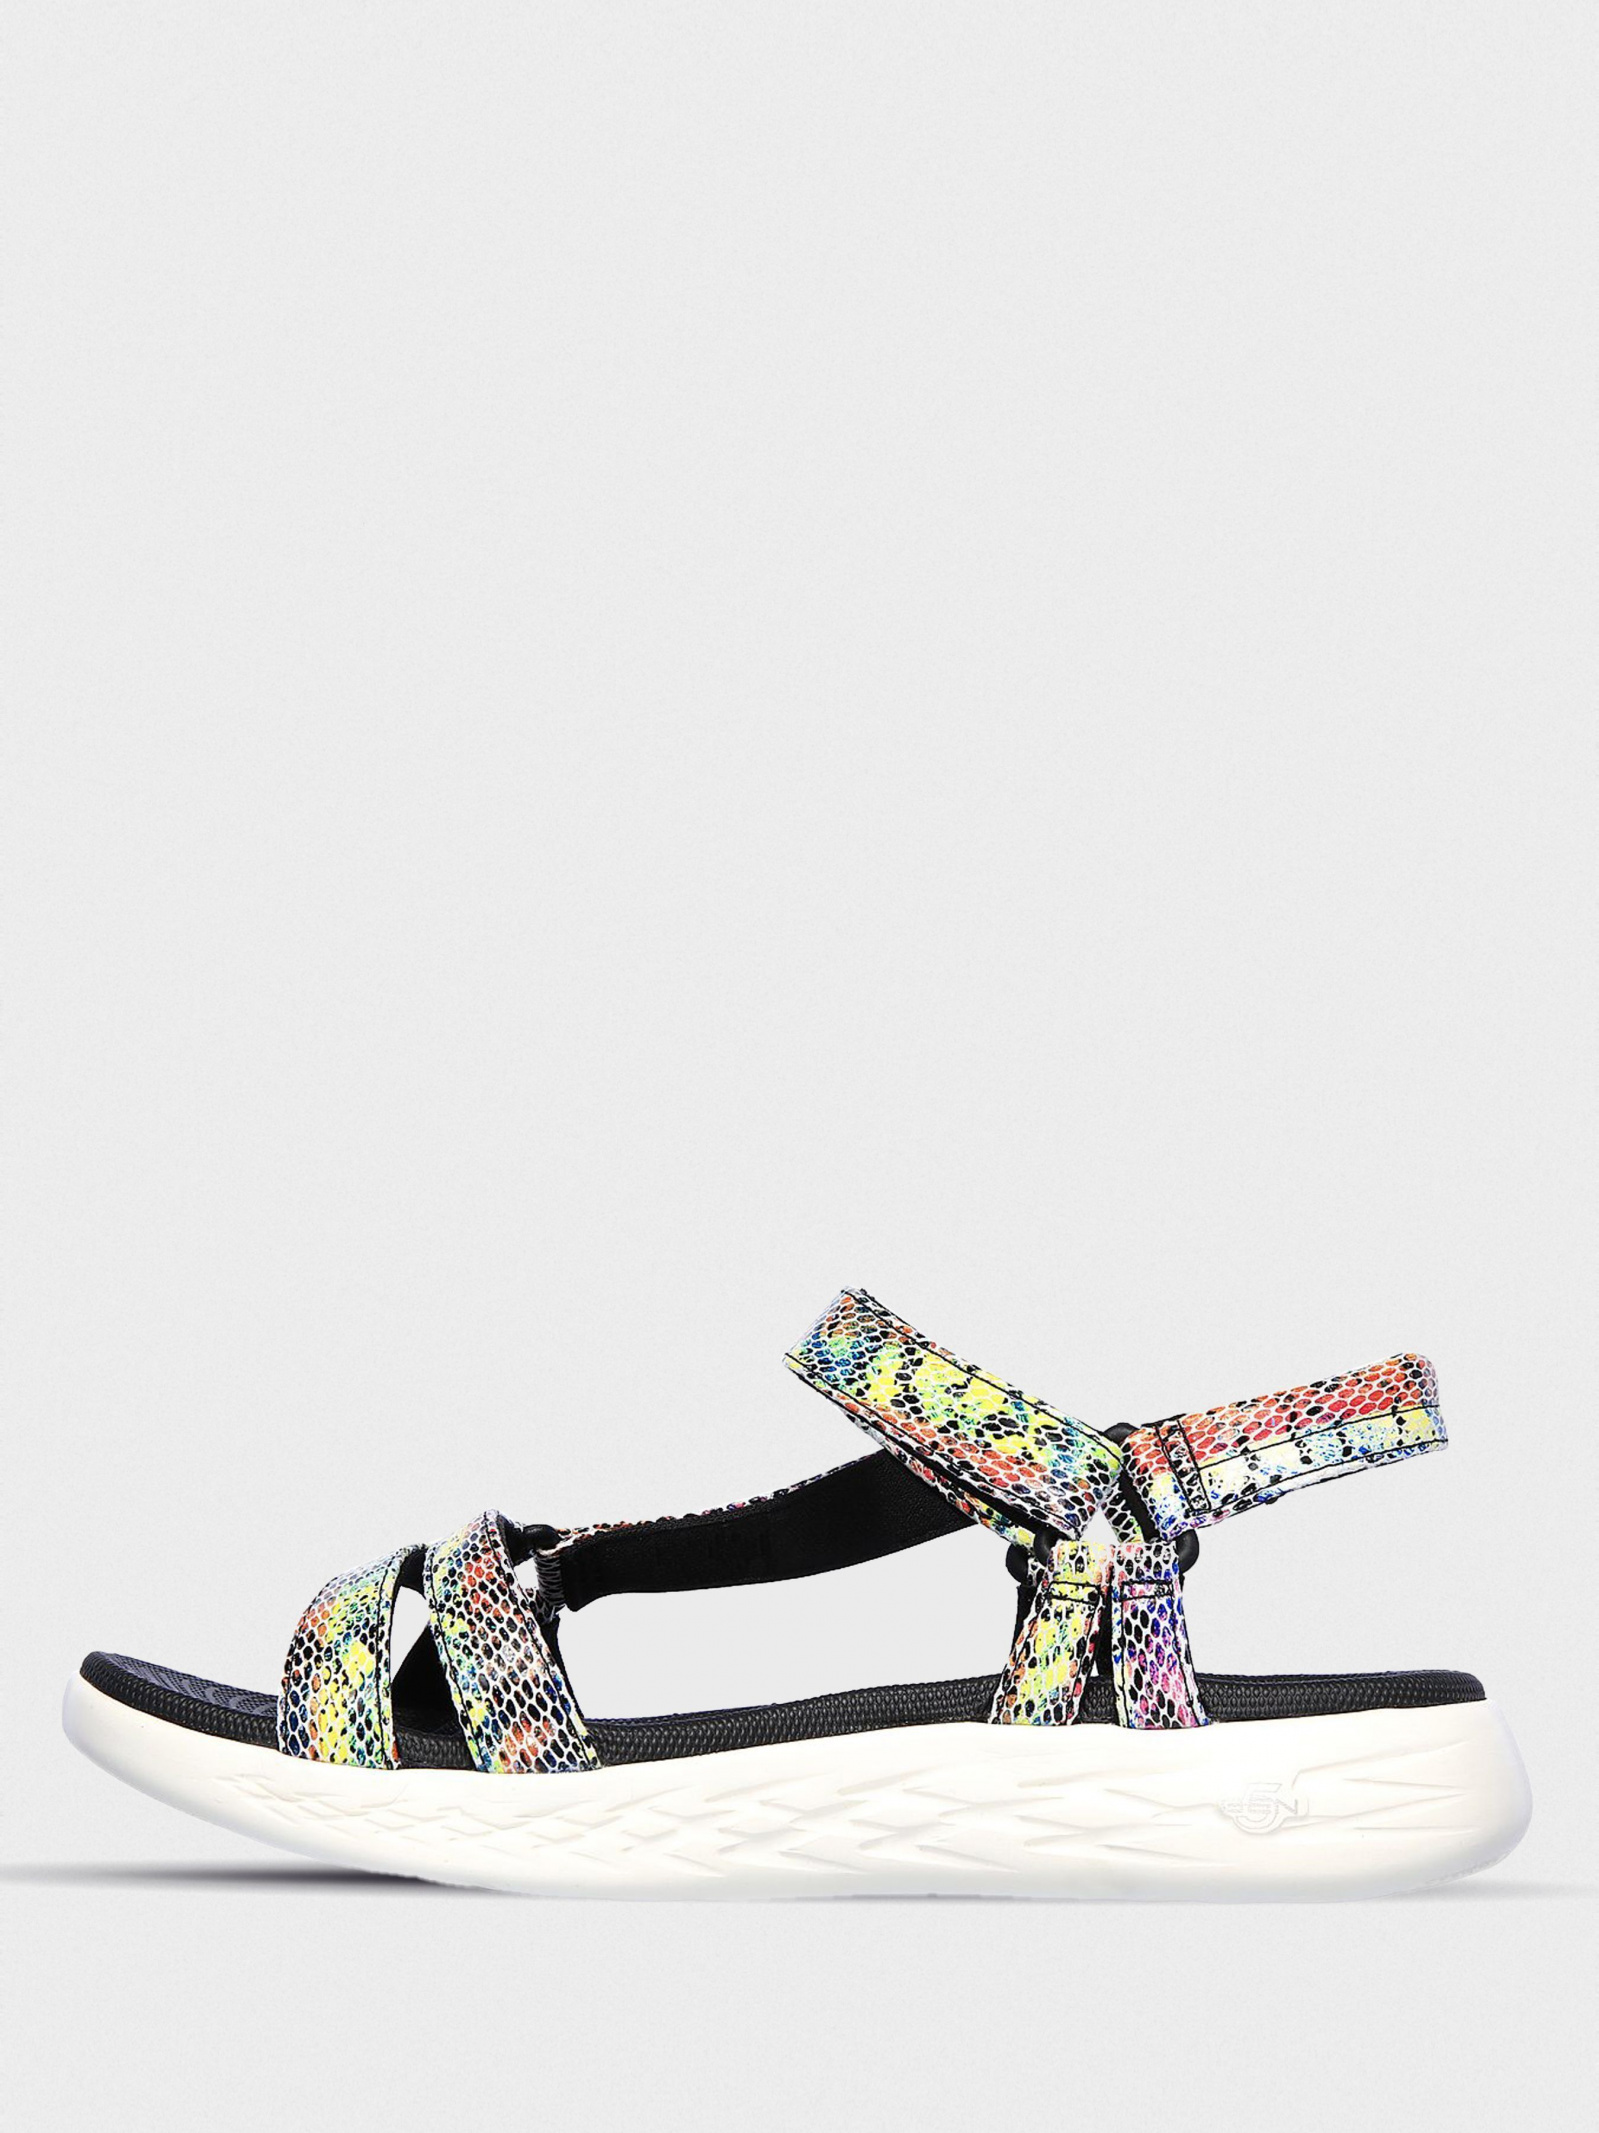 Сандалии женские Skechers On-The-Go KW5585 купить обувь, 2017